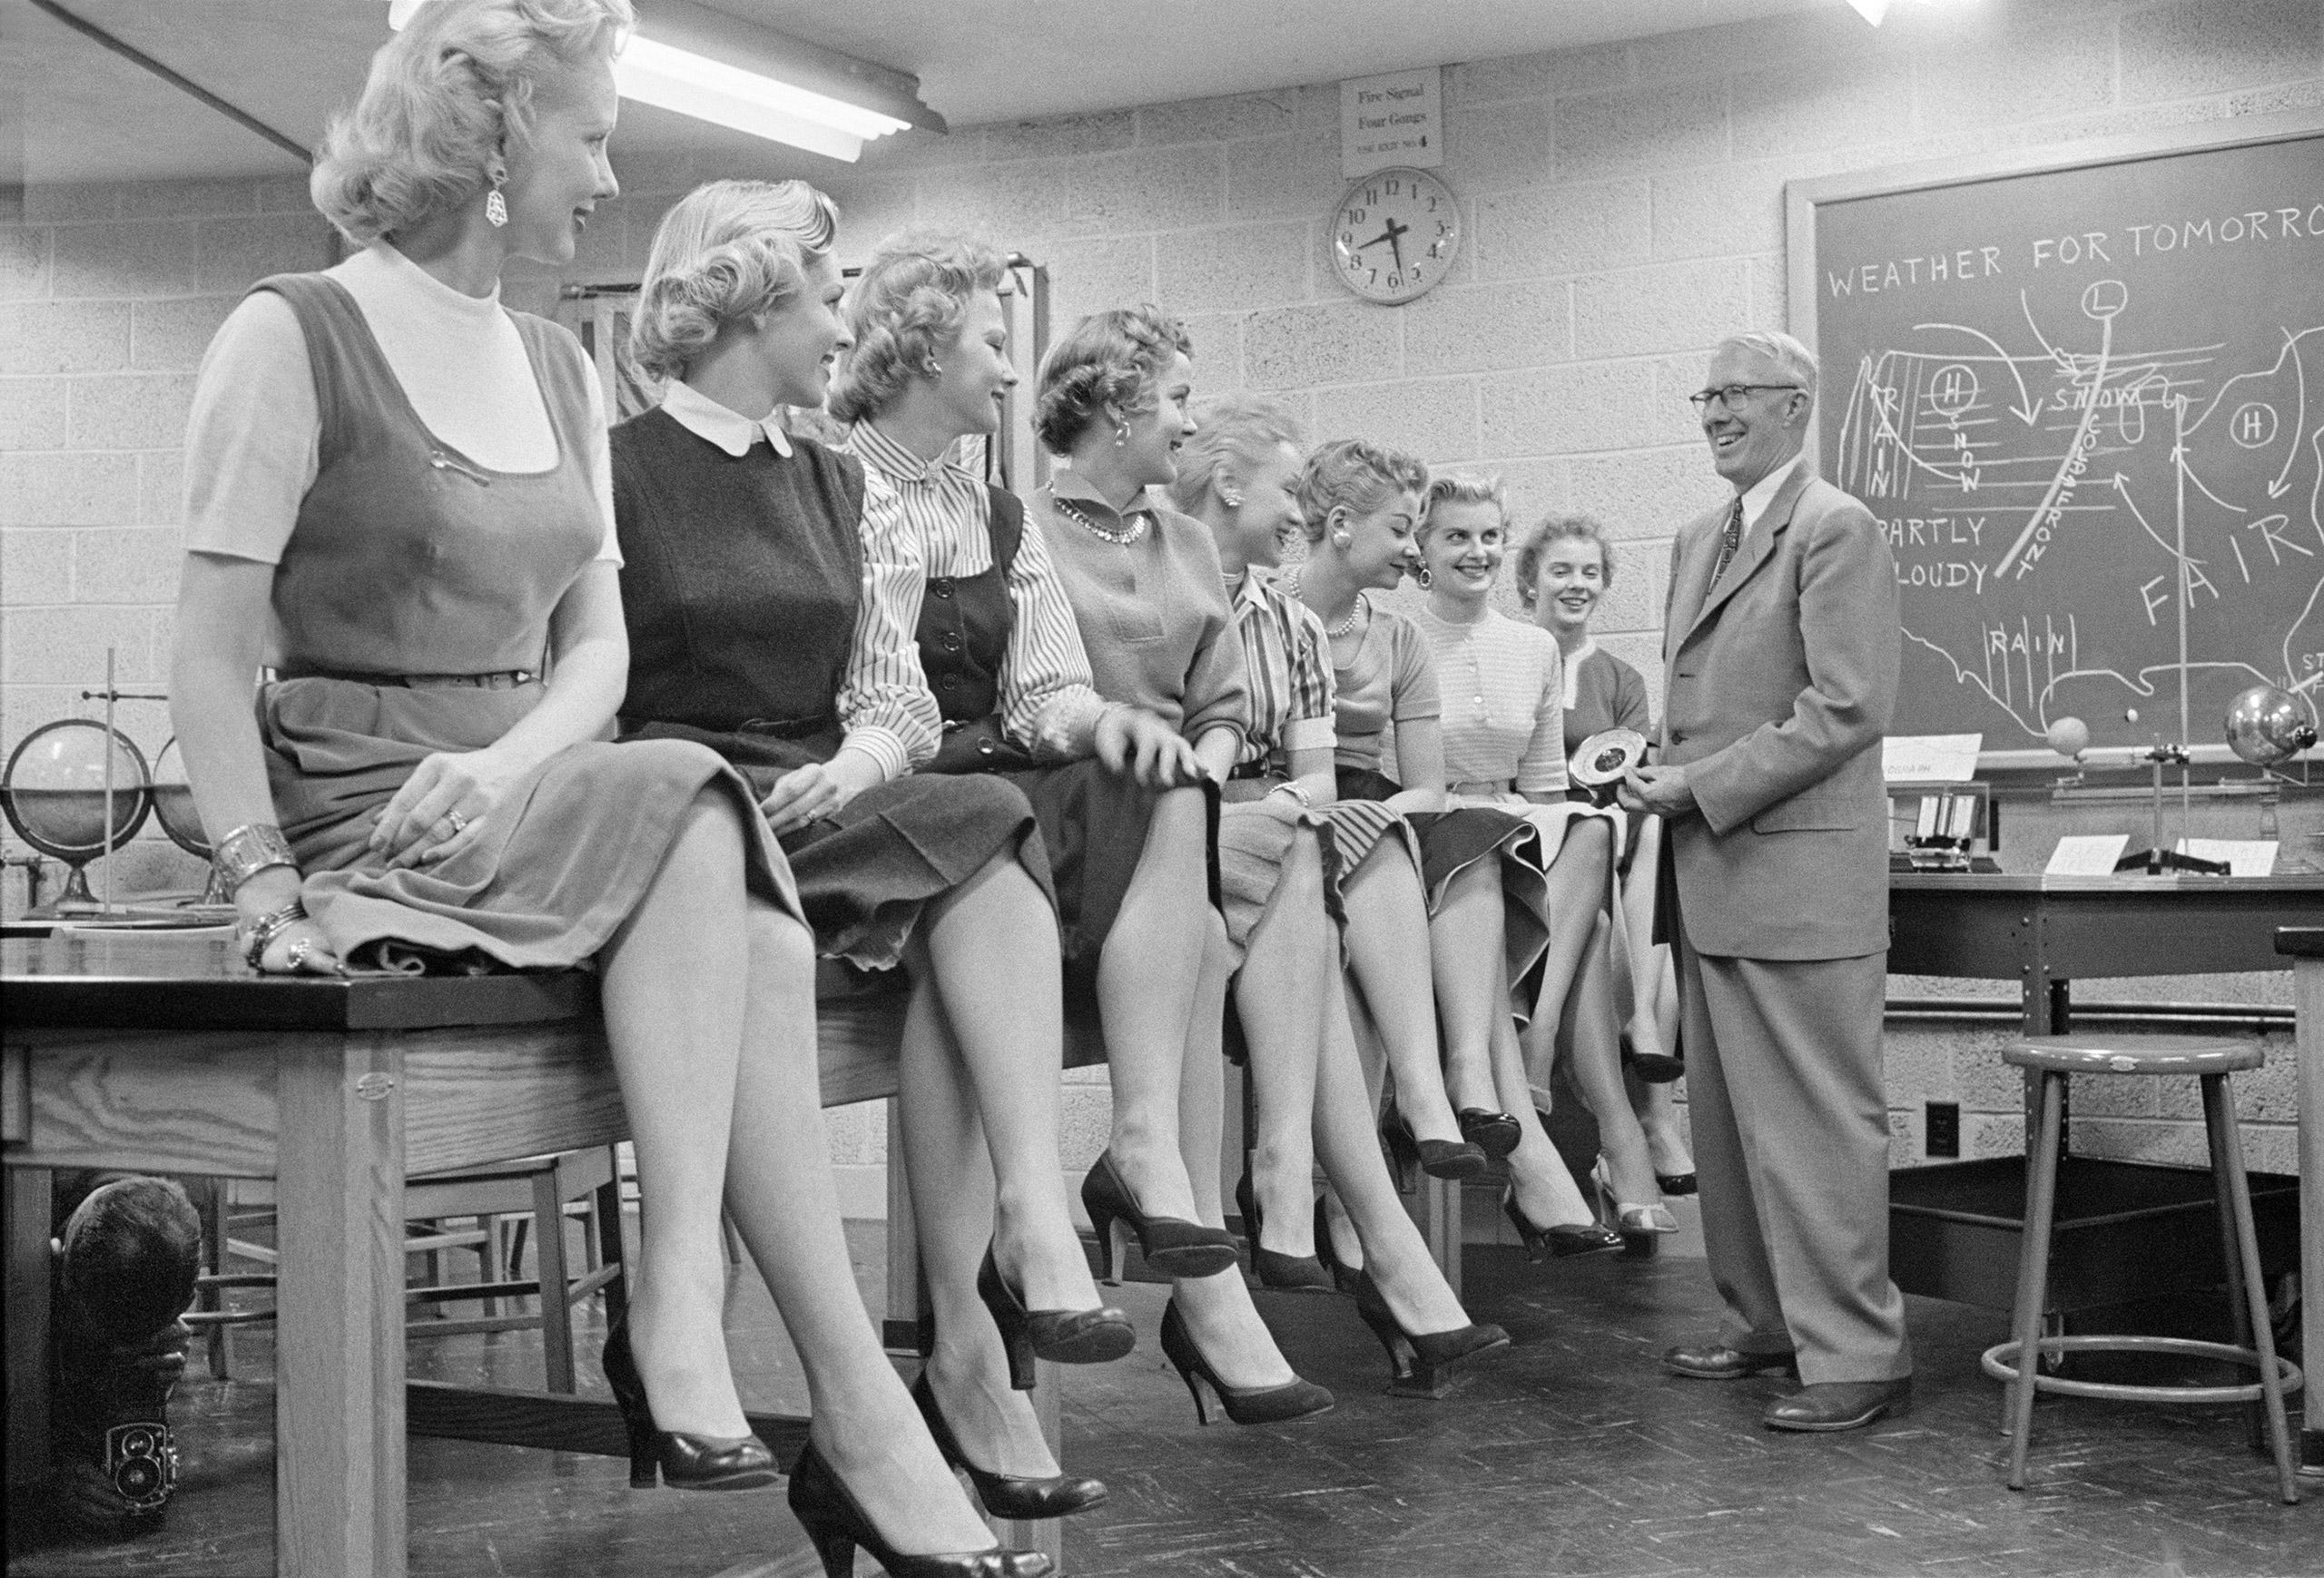 WJBK TV weather girls, Detroit, Michigan,1955.